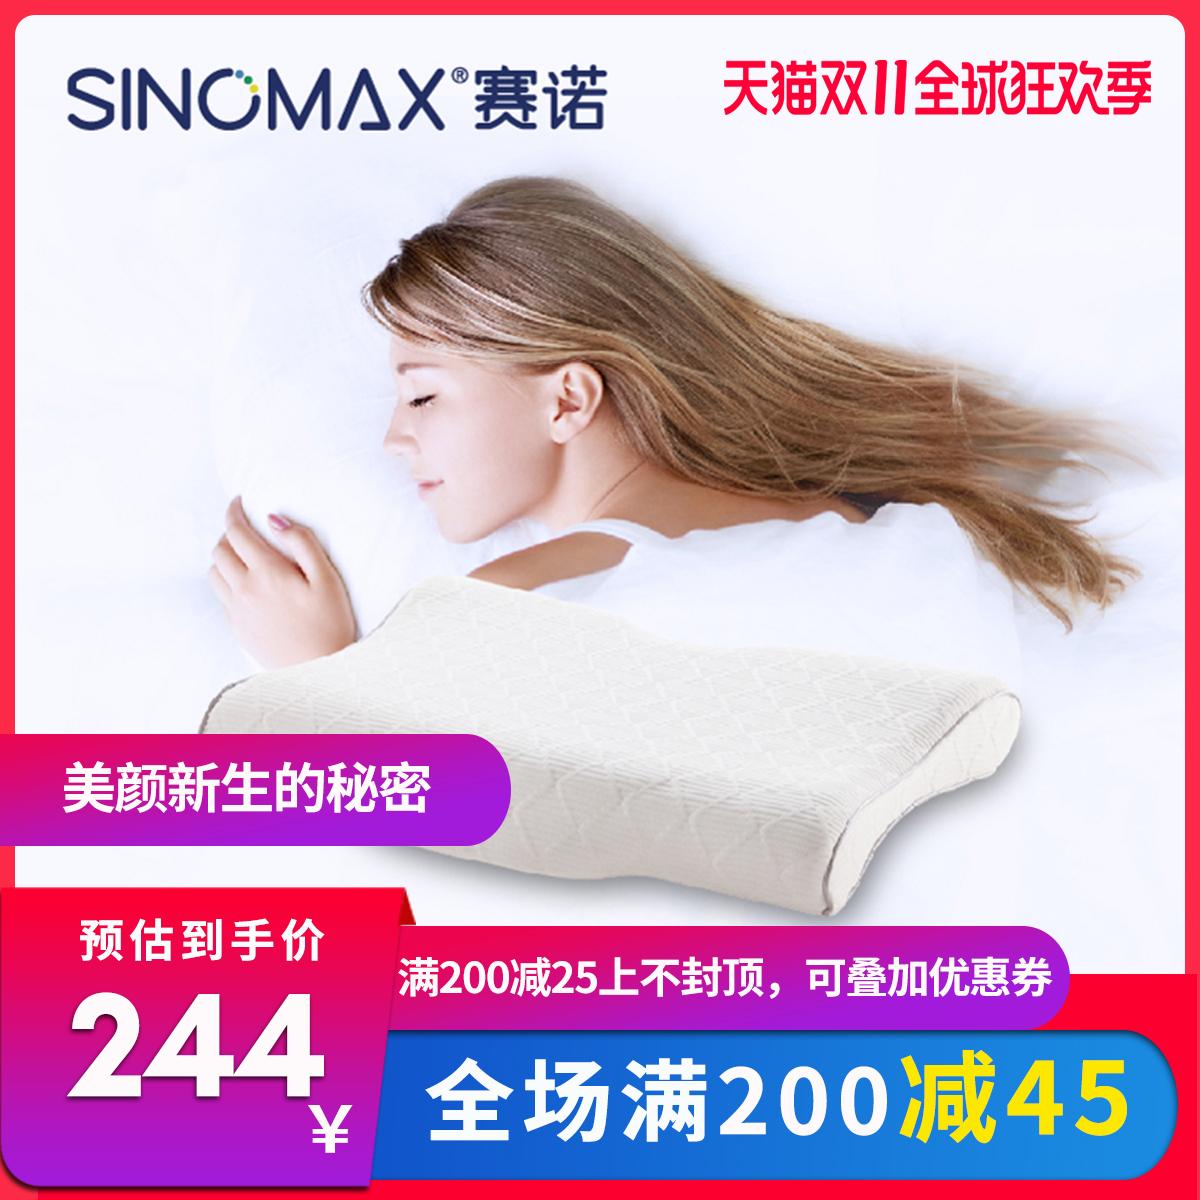 SINOMAX/赛诺4D美容枕蝶形记忆棉枕头护颈椎青少年低矮助眠保健枕